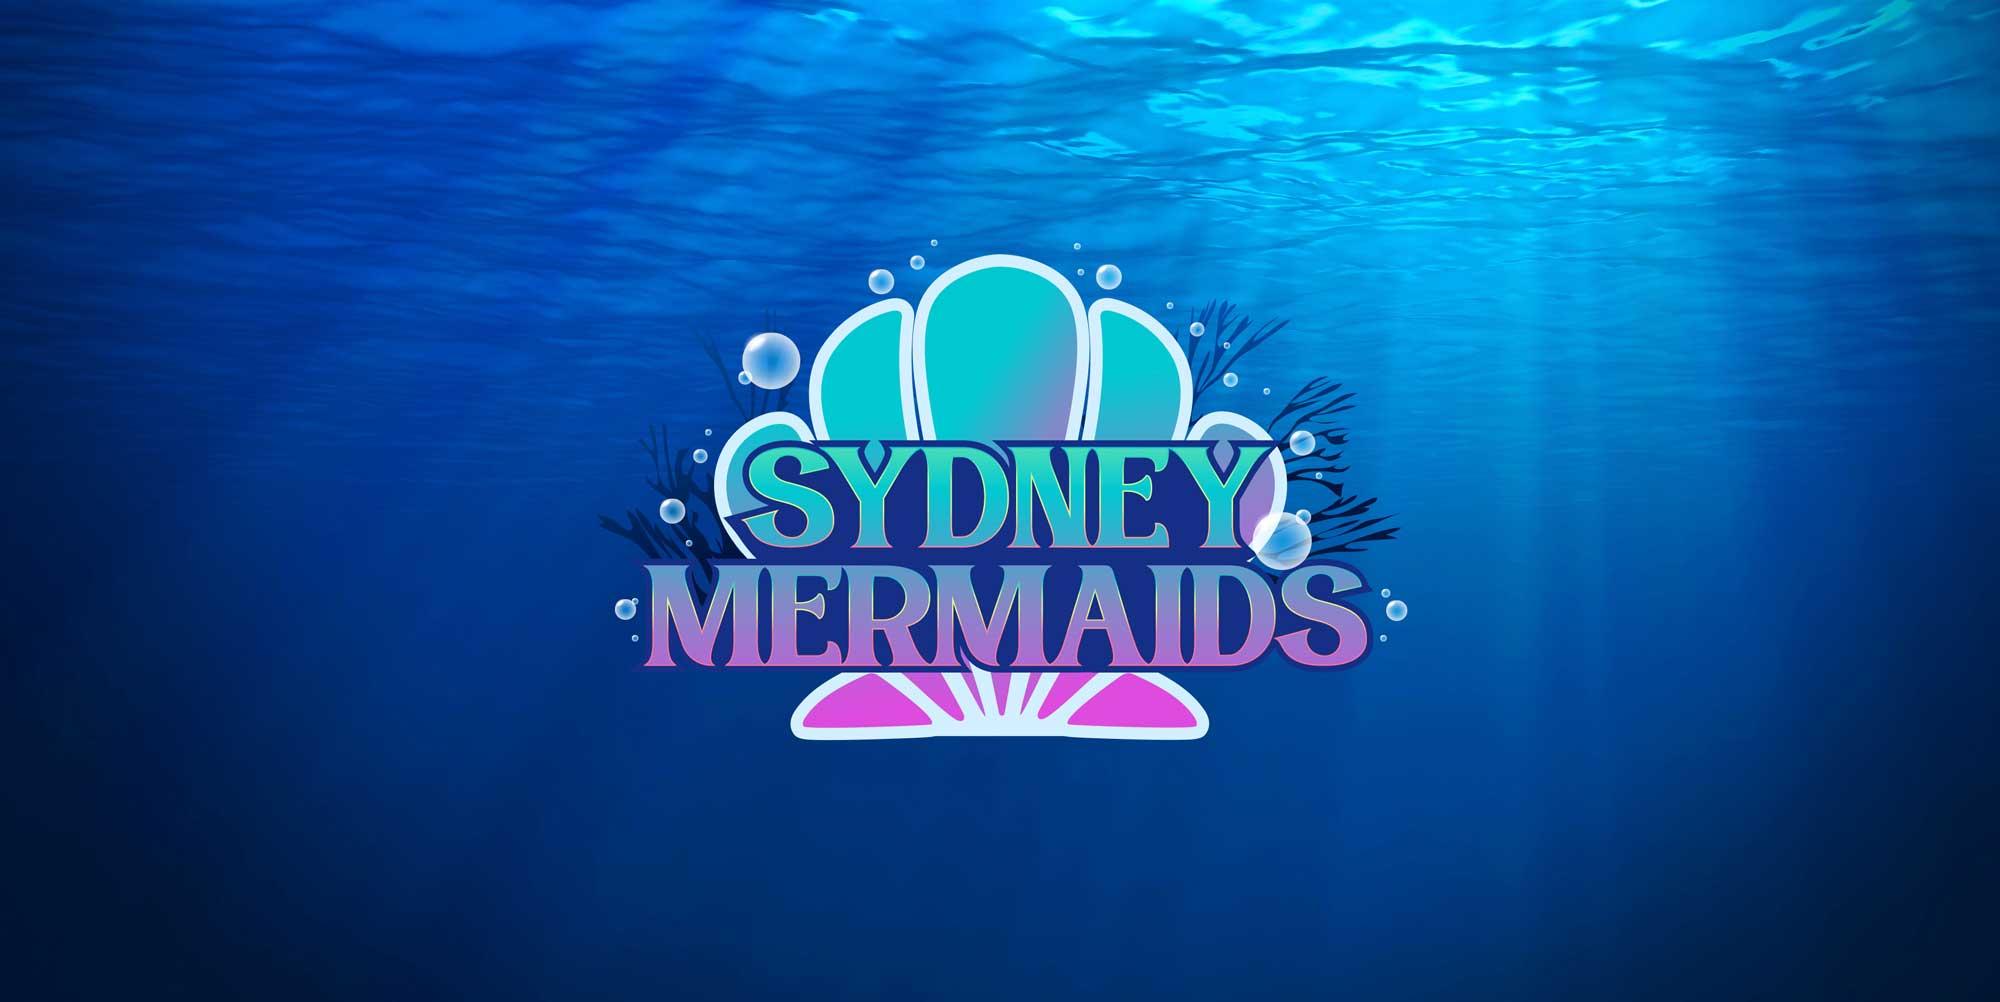 Sydney Mermaids